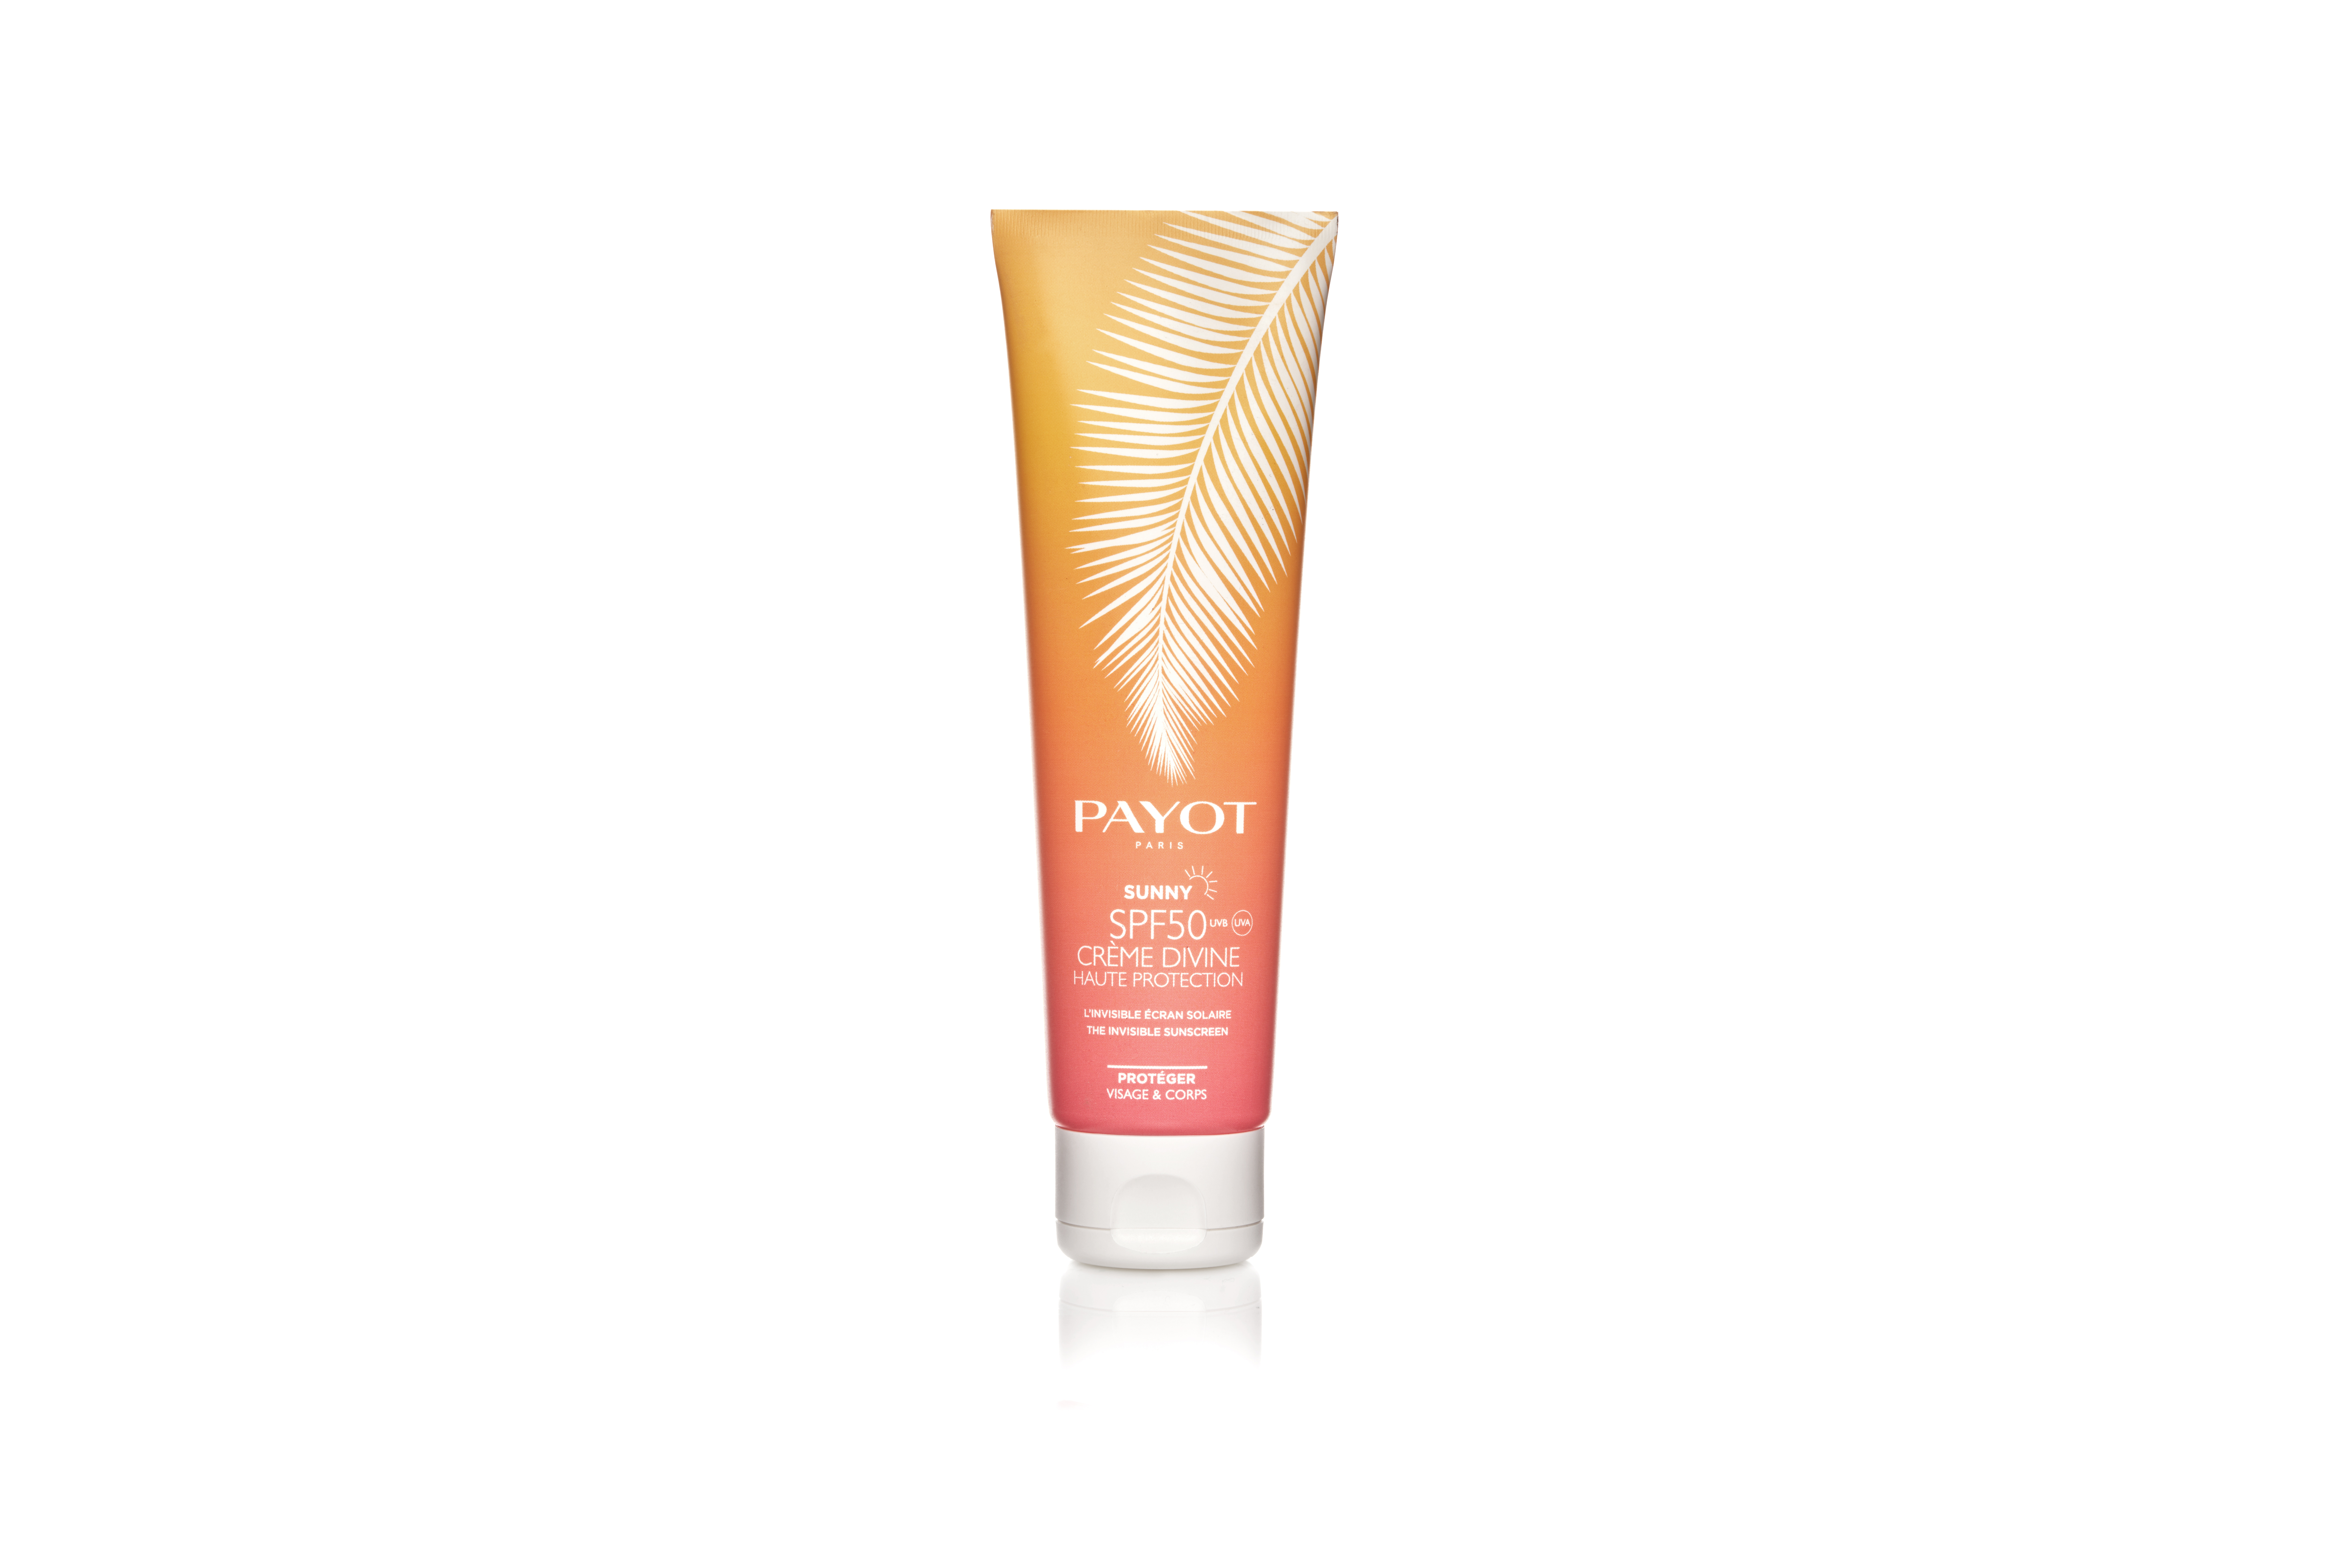 PAYOT Sunny Crème divine SPF 50